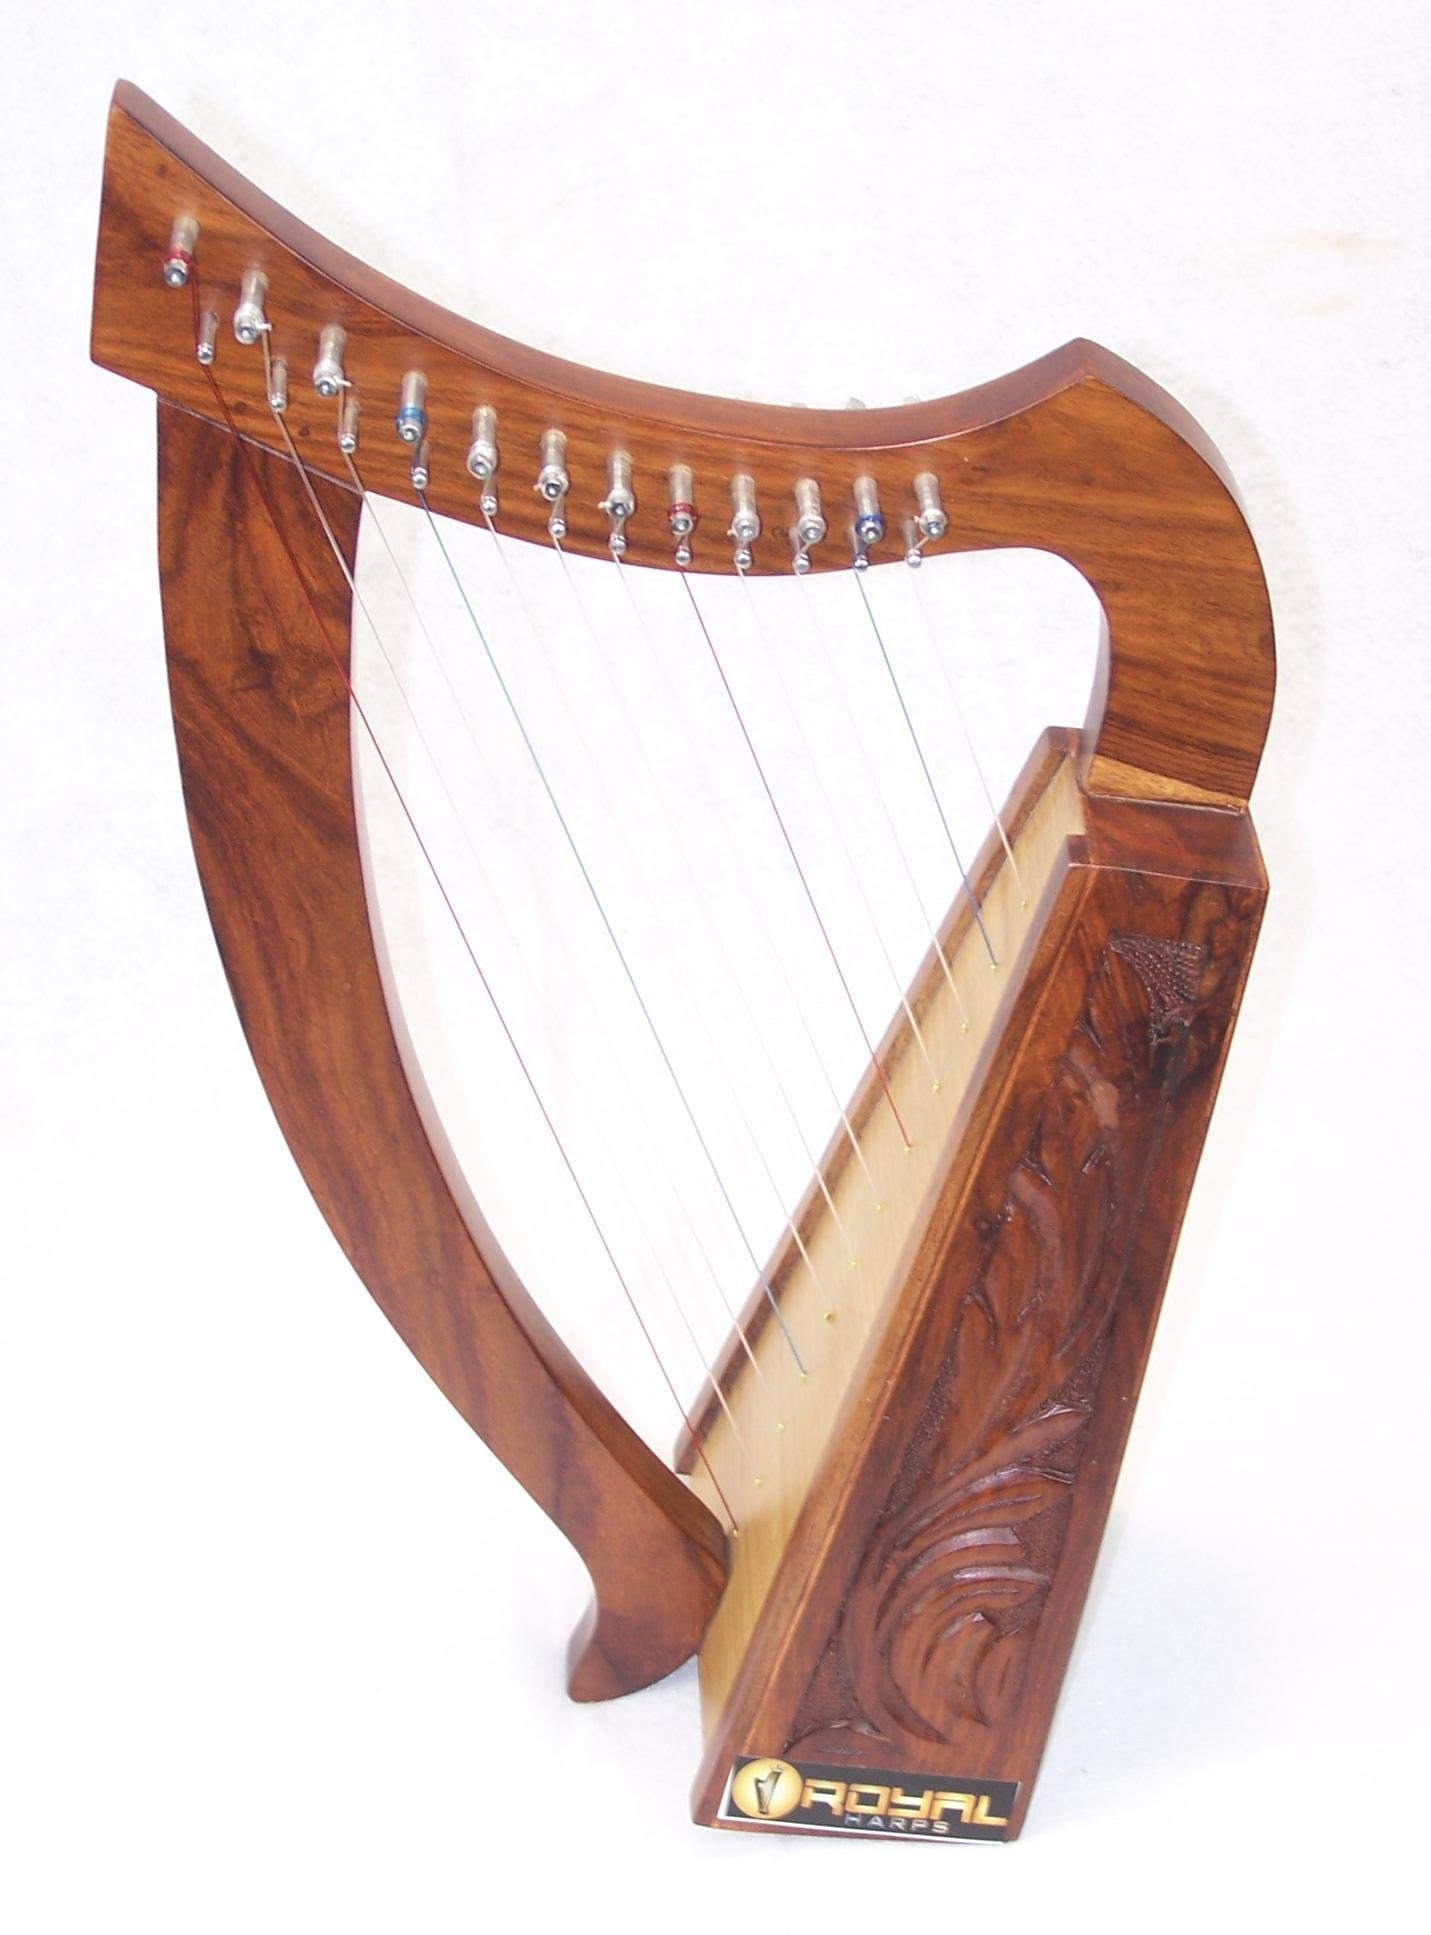 Celtic Irish Baby Harp 12 Strings Solid Wood Free Bag Strings Key by ROYAL HARPS (Image #8)